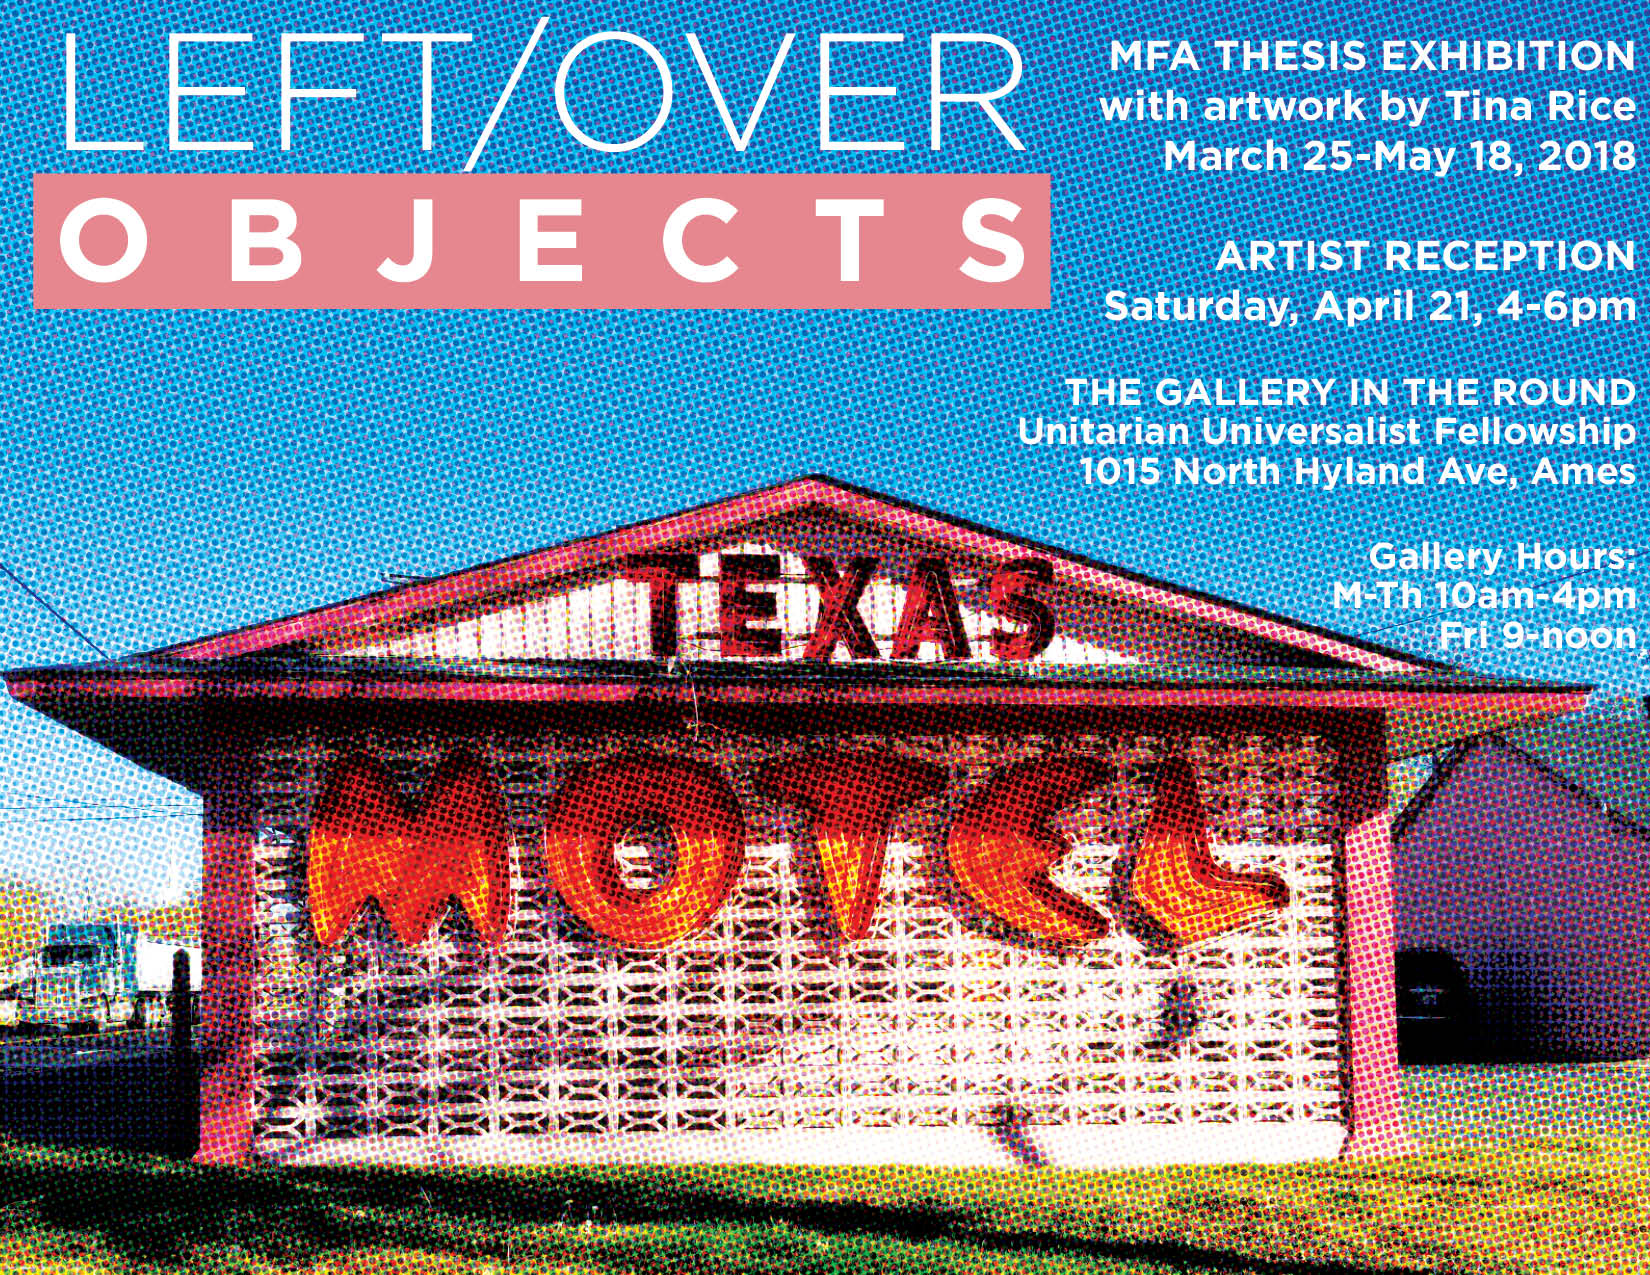 Tina Rice MFA Thesis Exhibition Poster